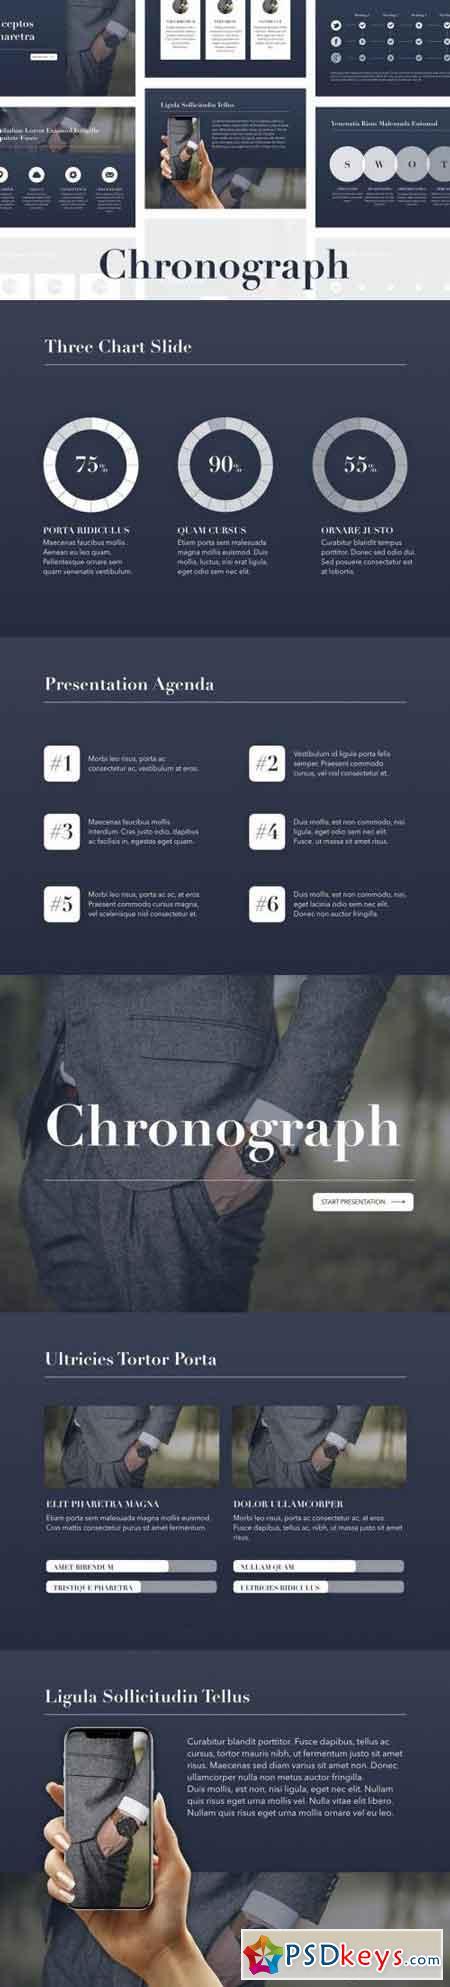 Chronograph Keynote Template